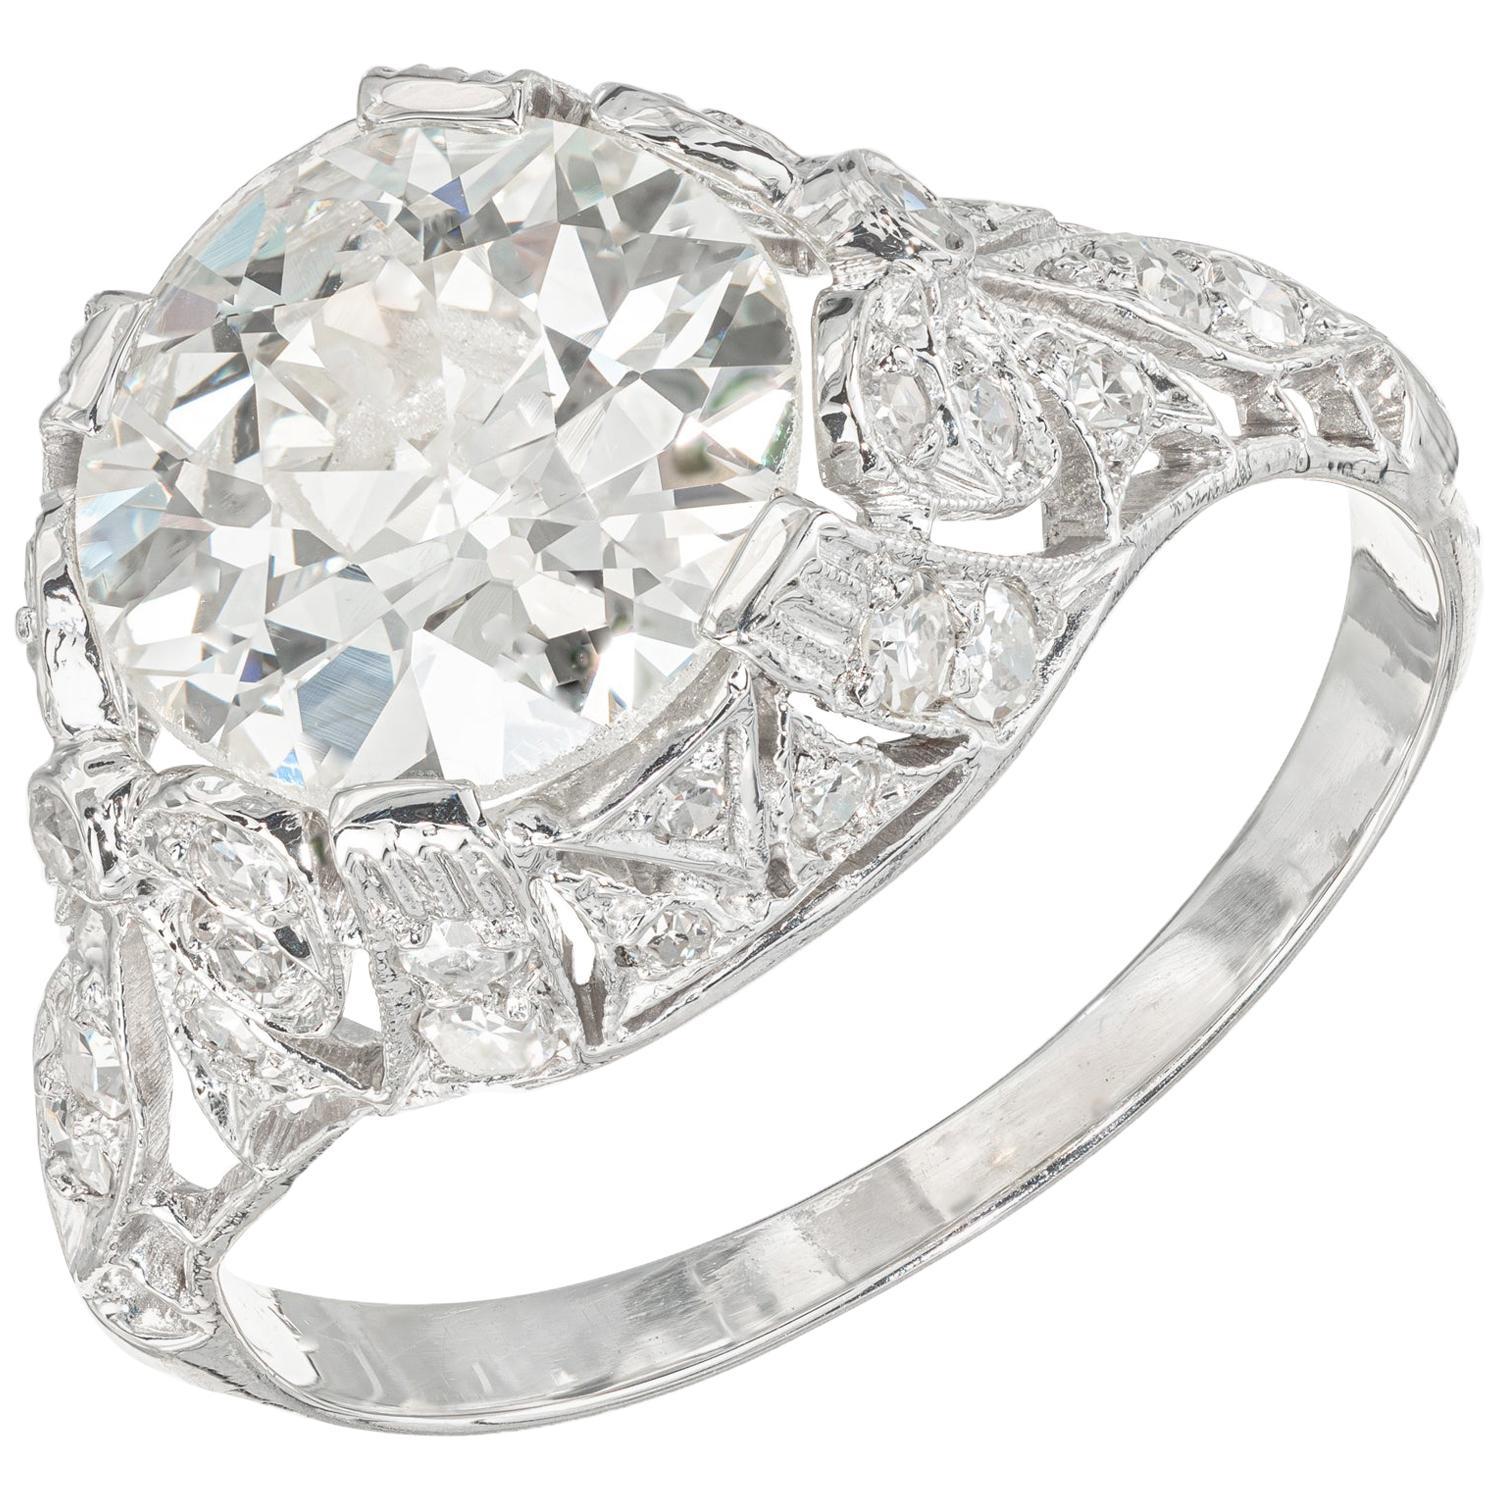 EGL Certified 2.48 Carat Diamond Platinum Engagement Ring